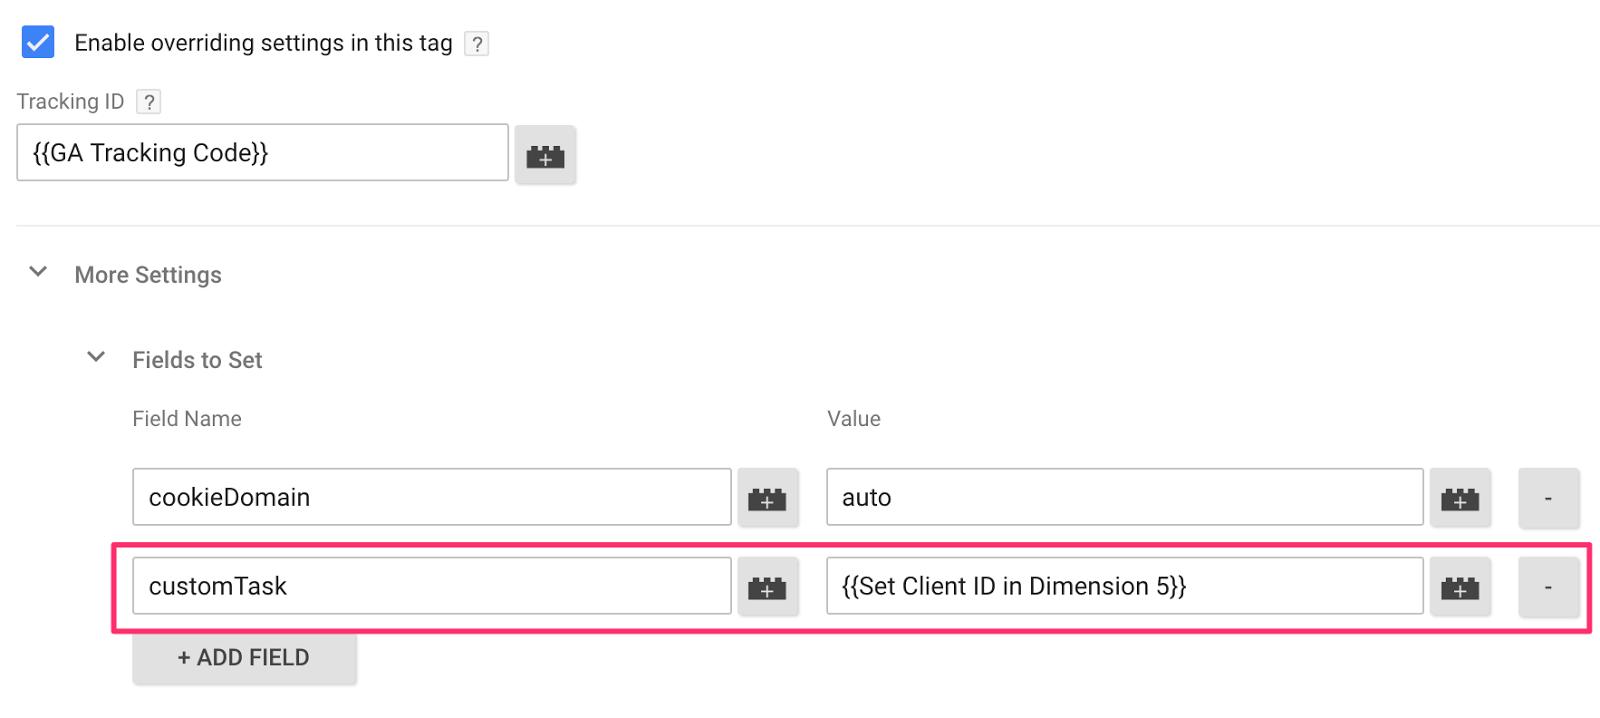 google-analytics-tag-manager-custom-tasks.png